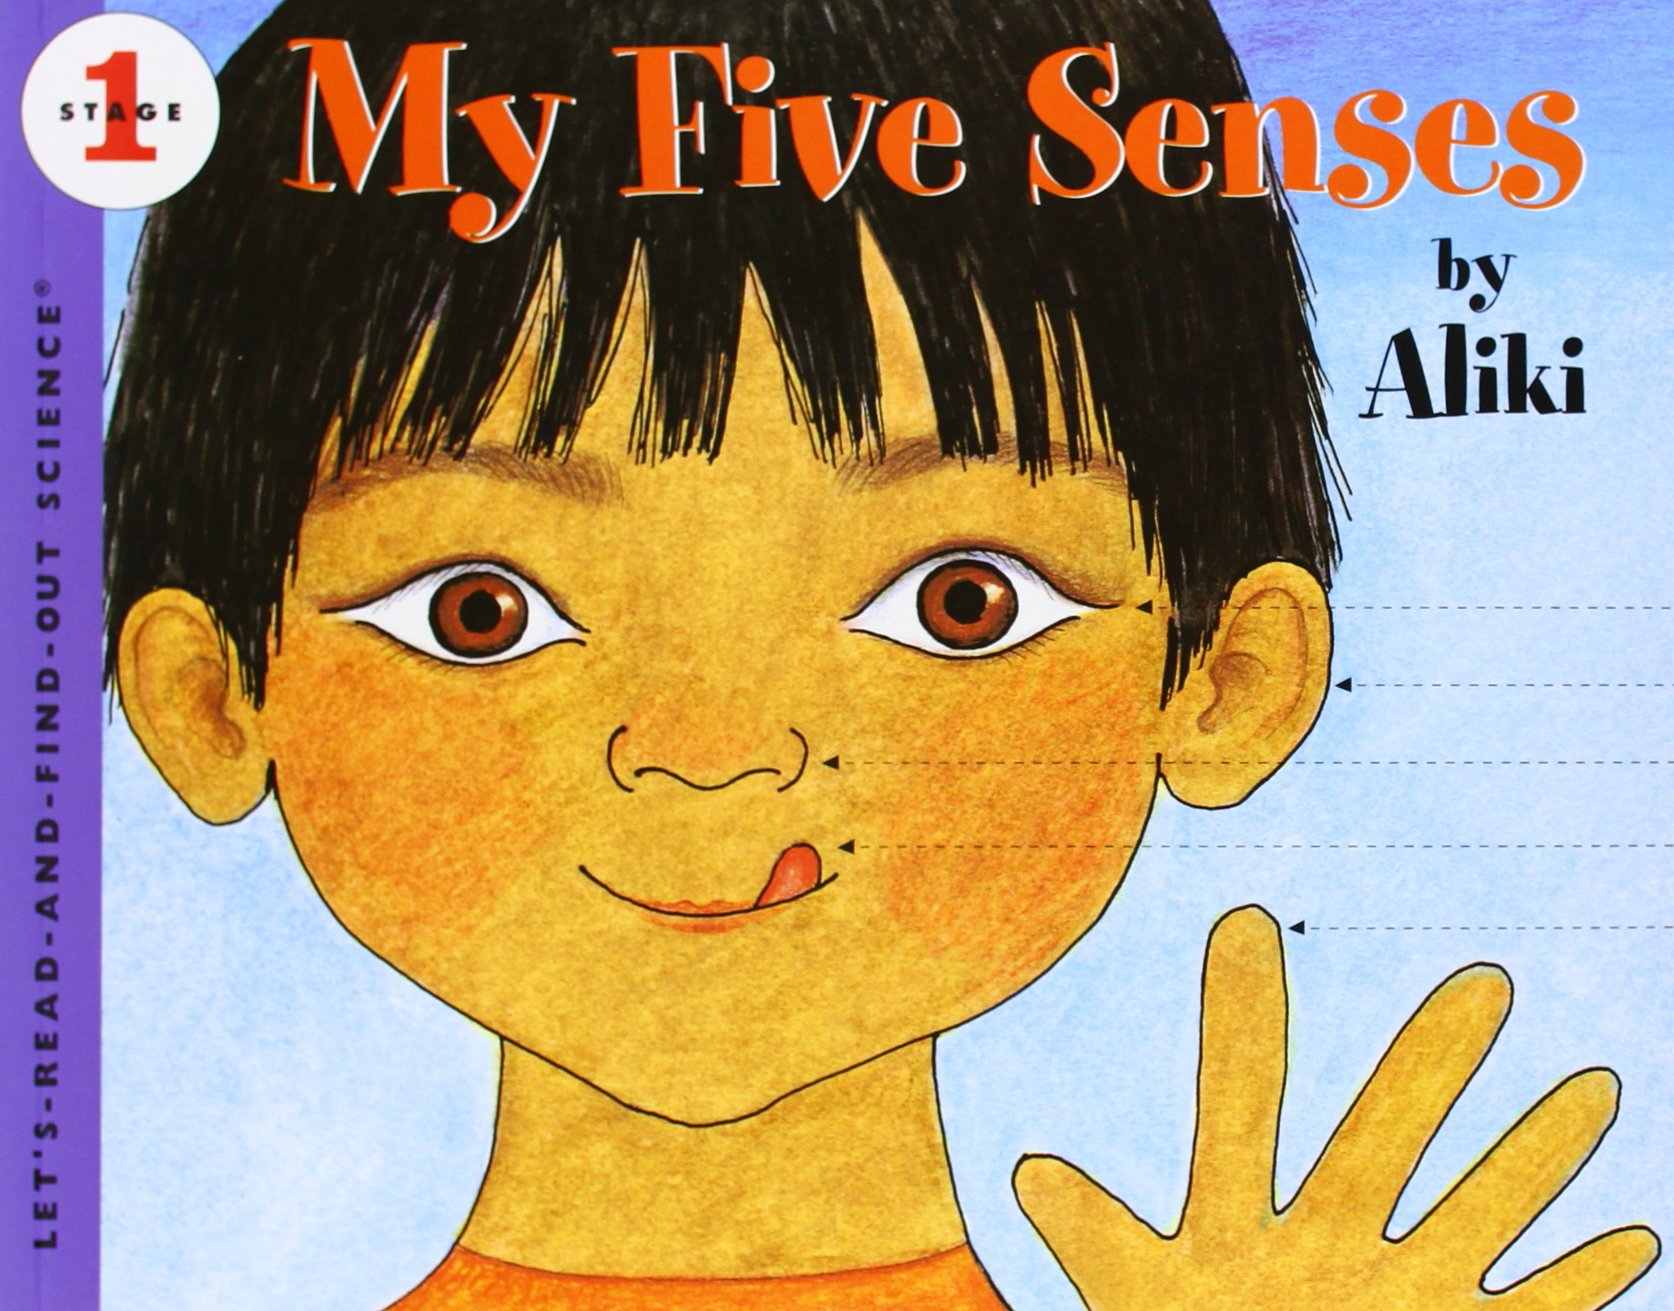 Five Sense Books For Kids